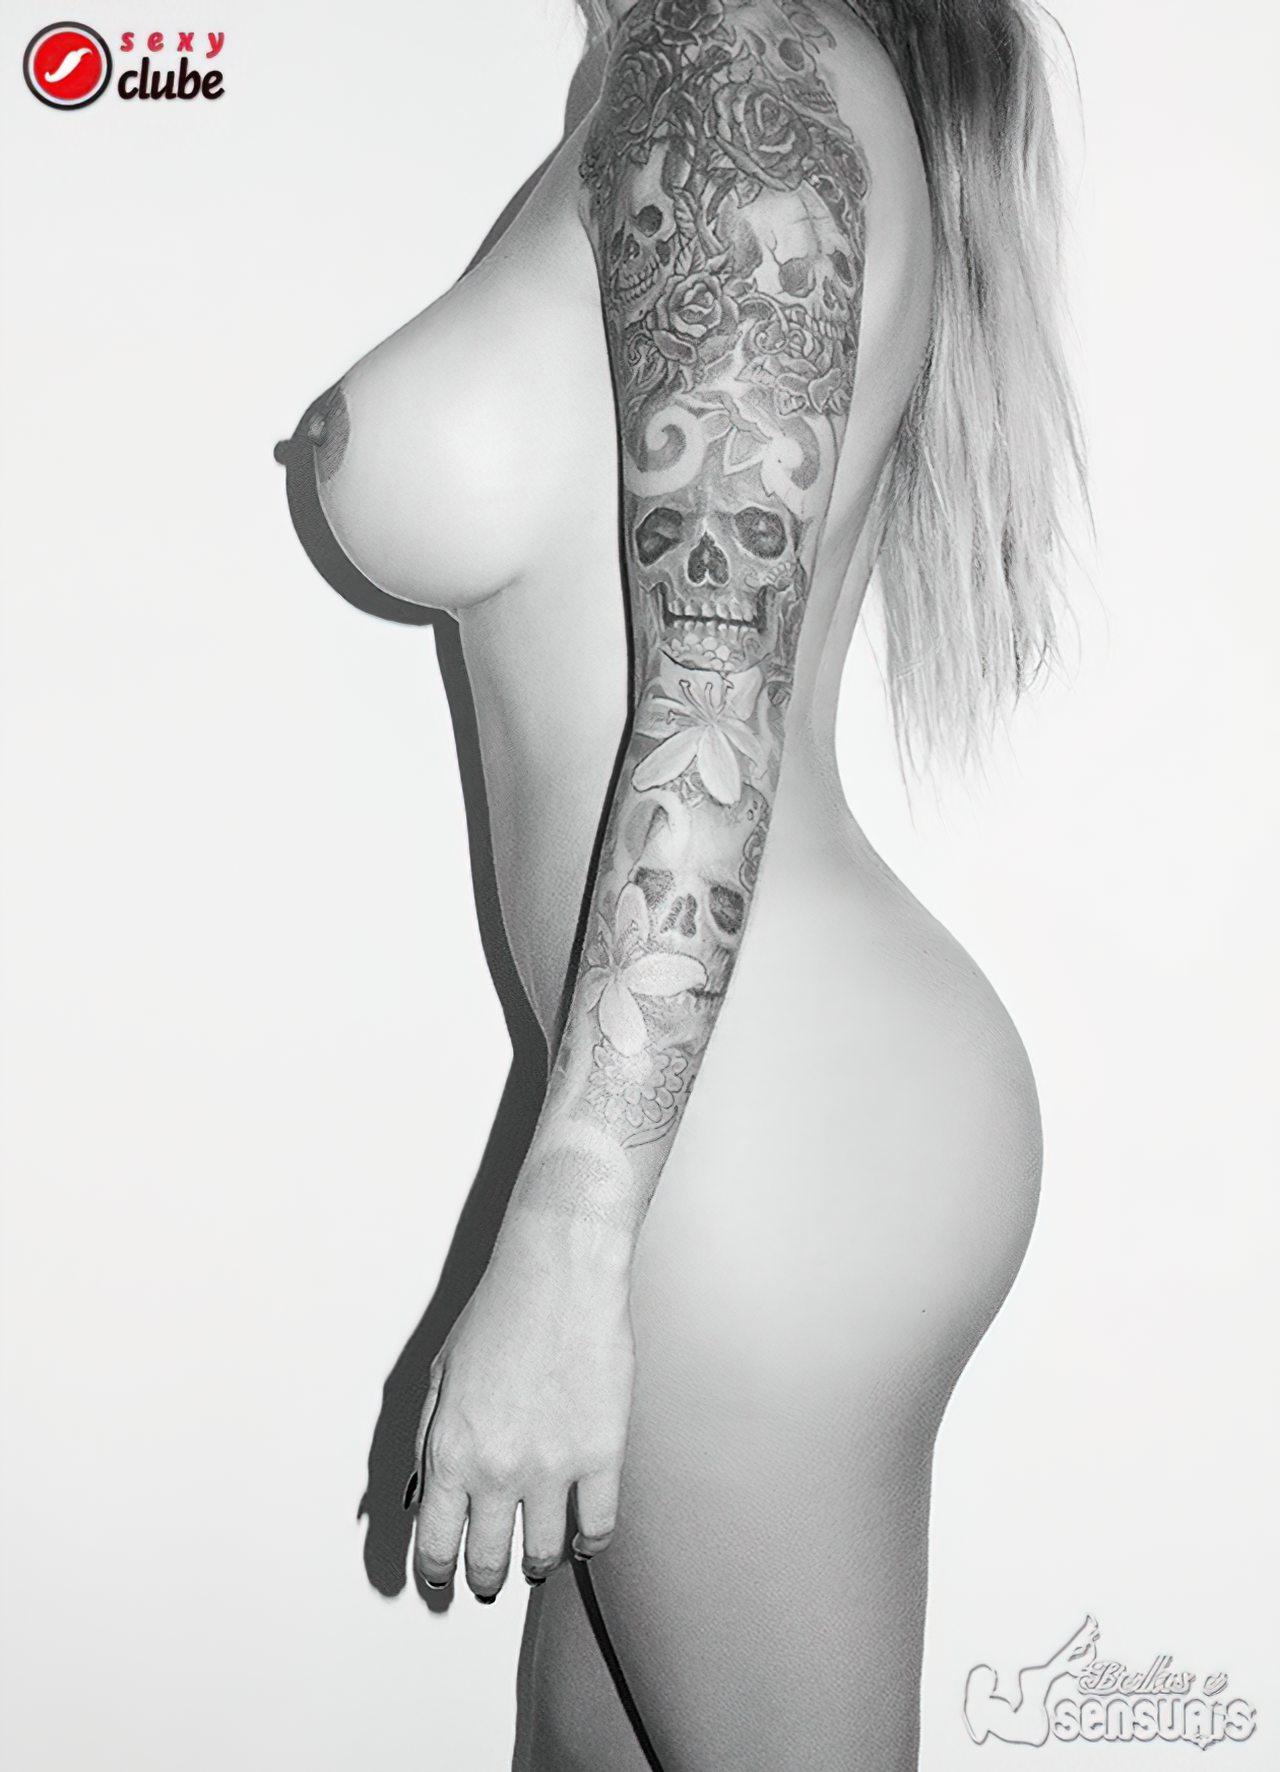 Clara Aguilar (36)